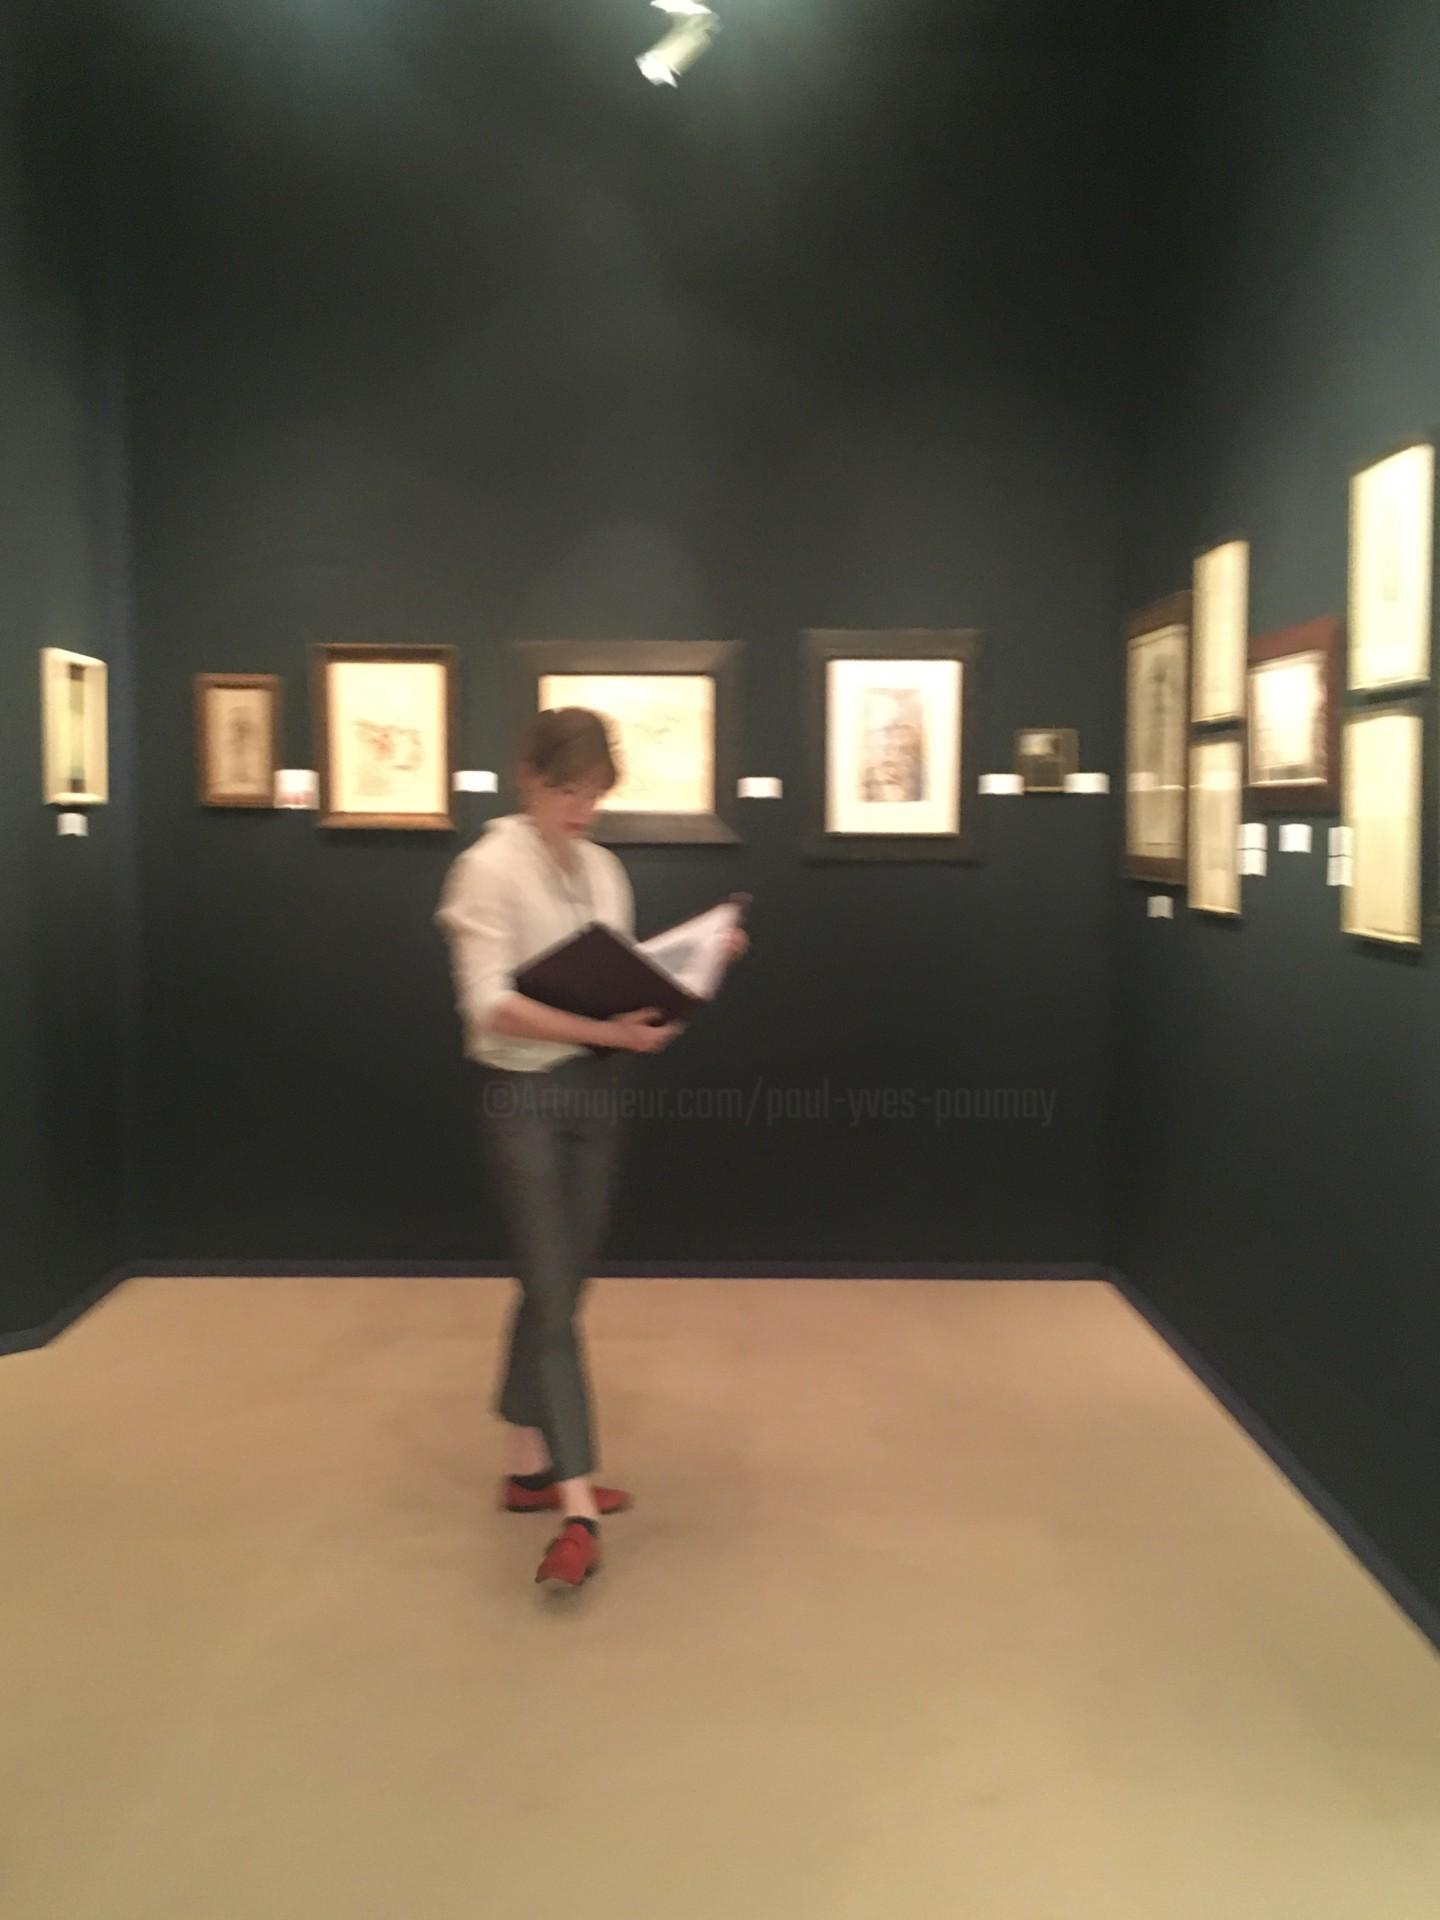 Paul Yves Poumay - art gallery